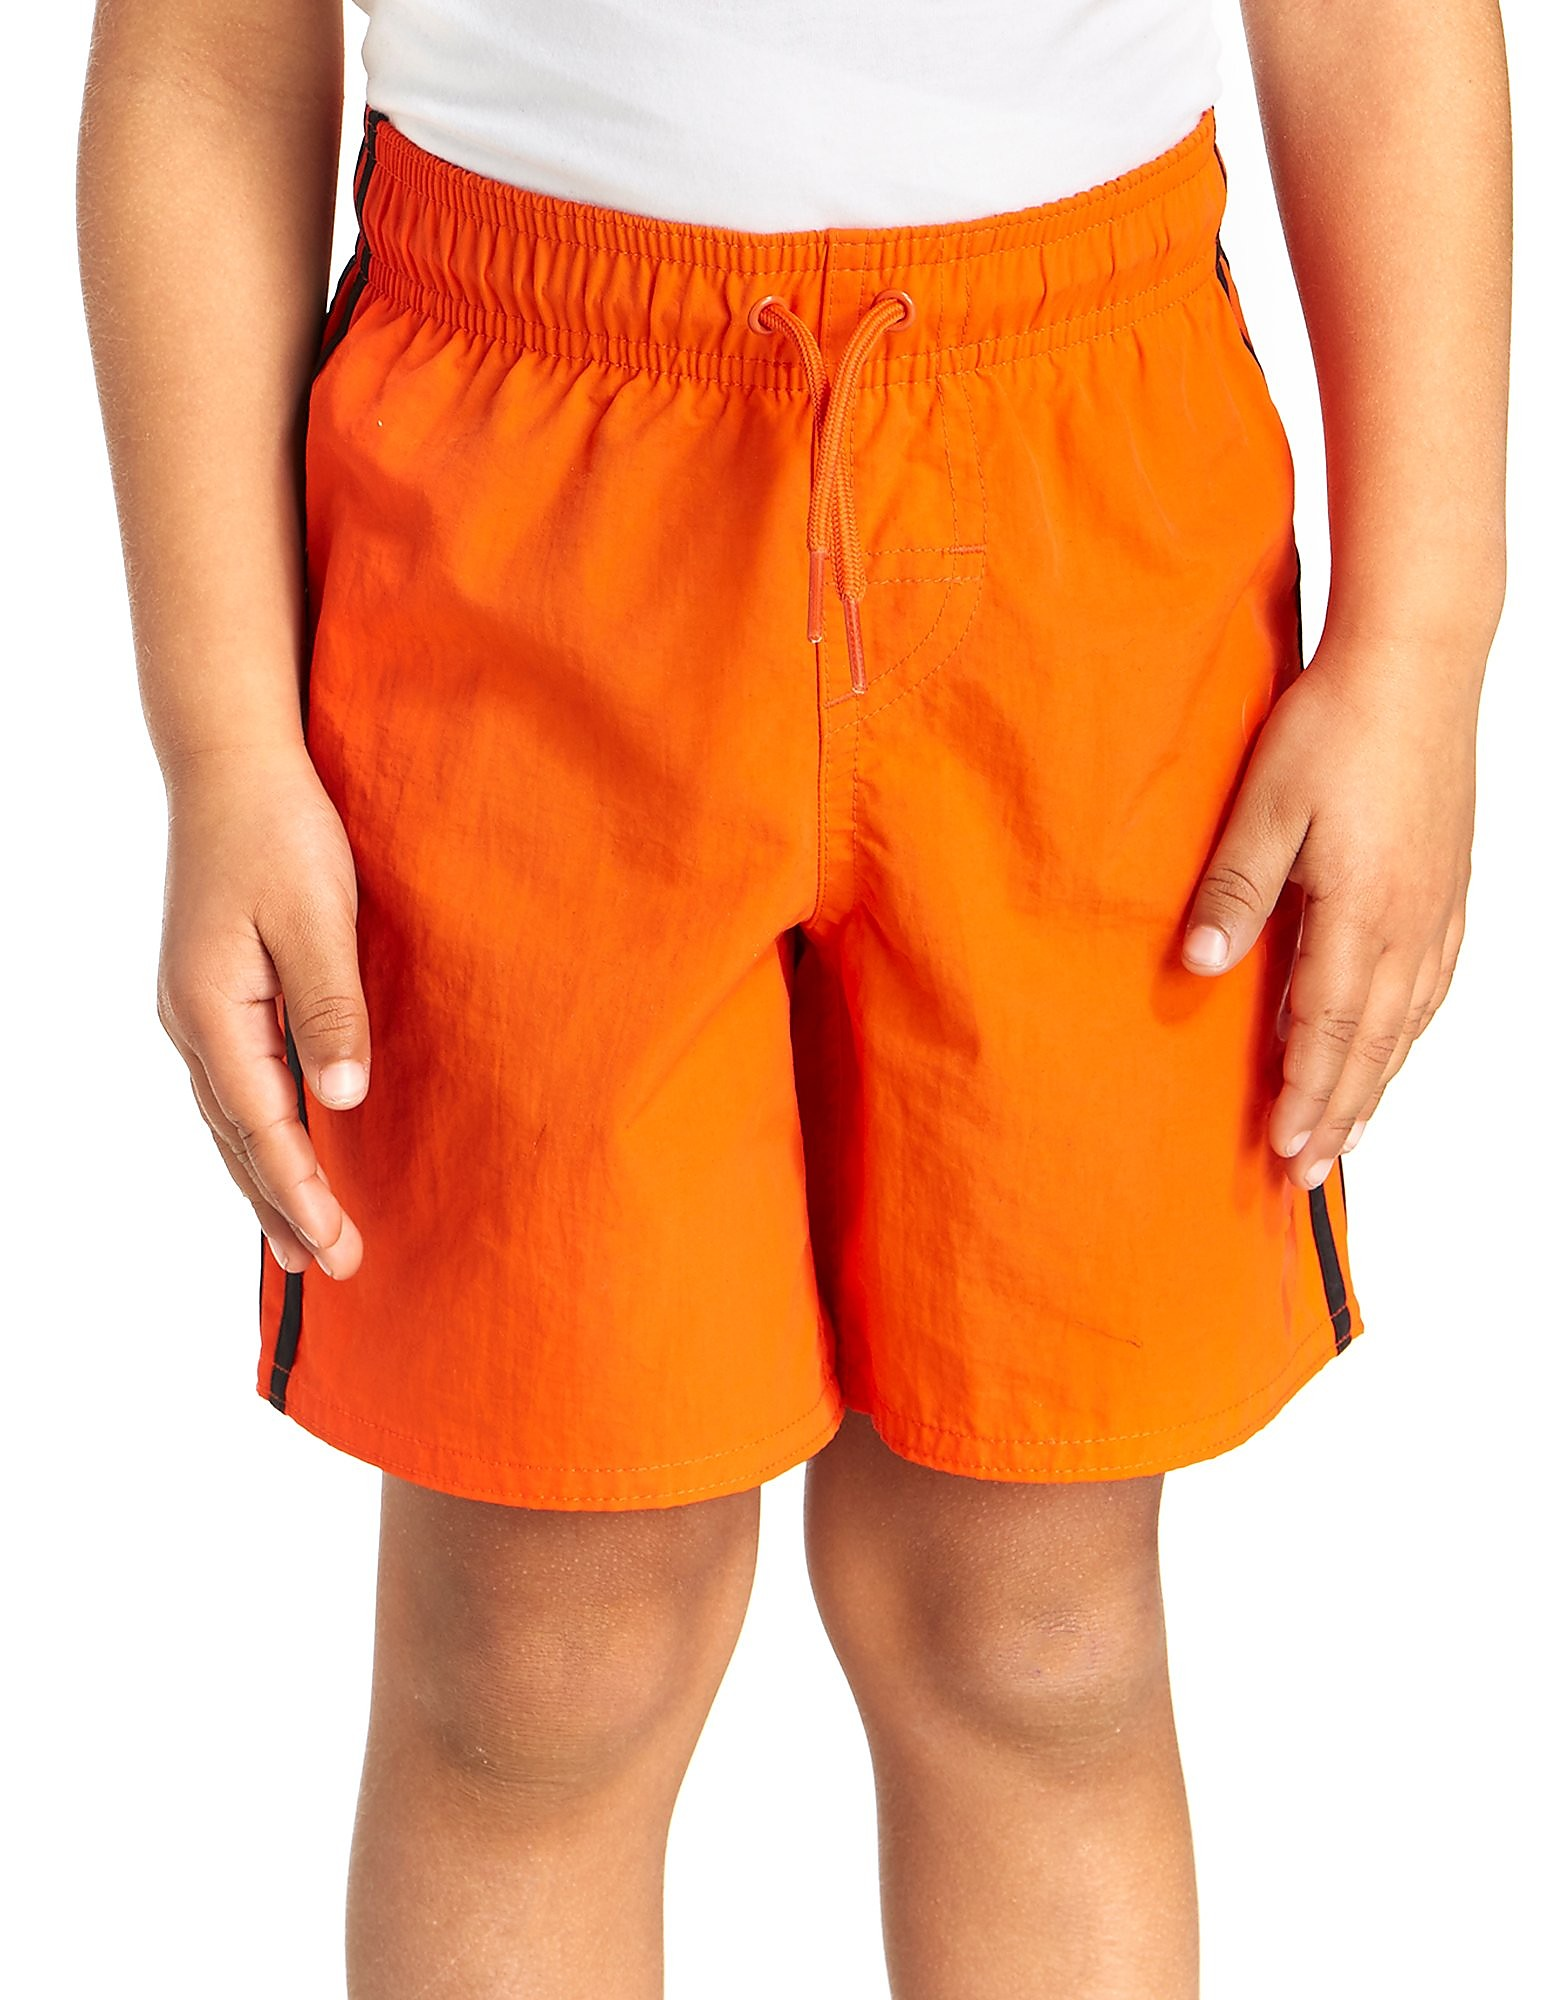 adidas Short de bain Linear pour enfant - Only at JD - Energy Orange/Black, Energy Orange/Black